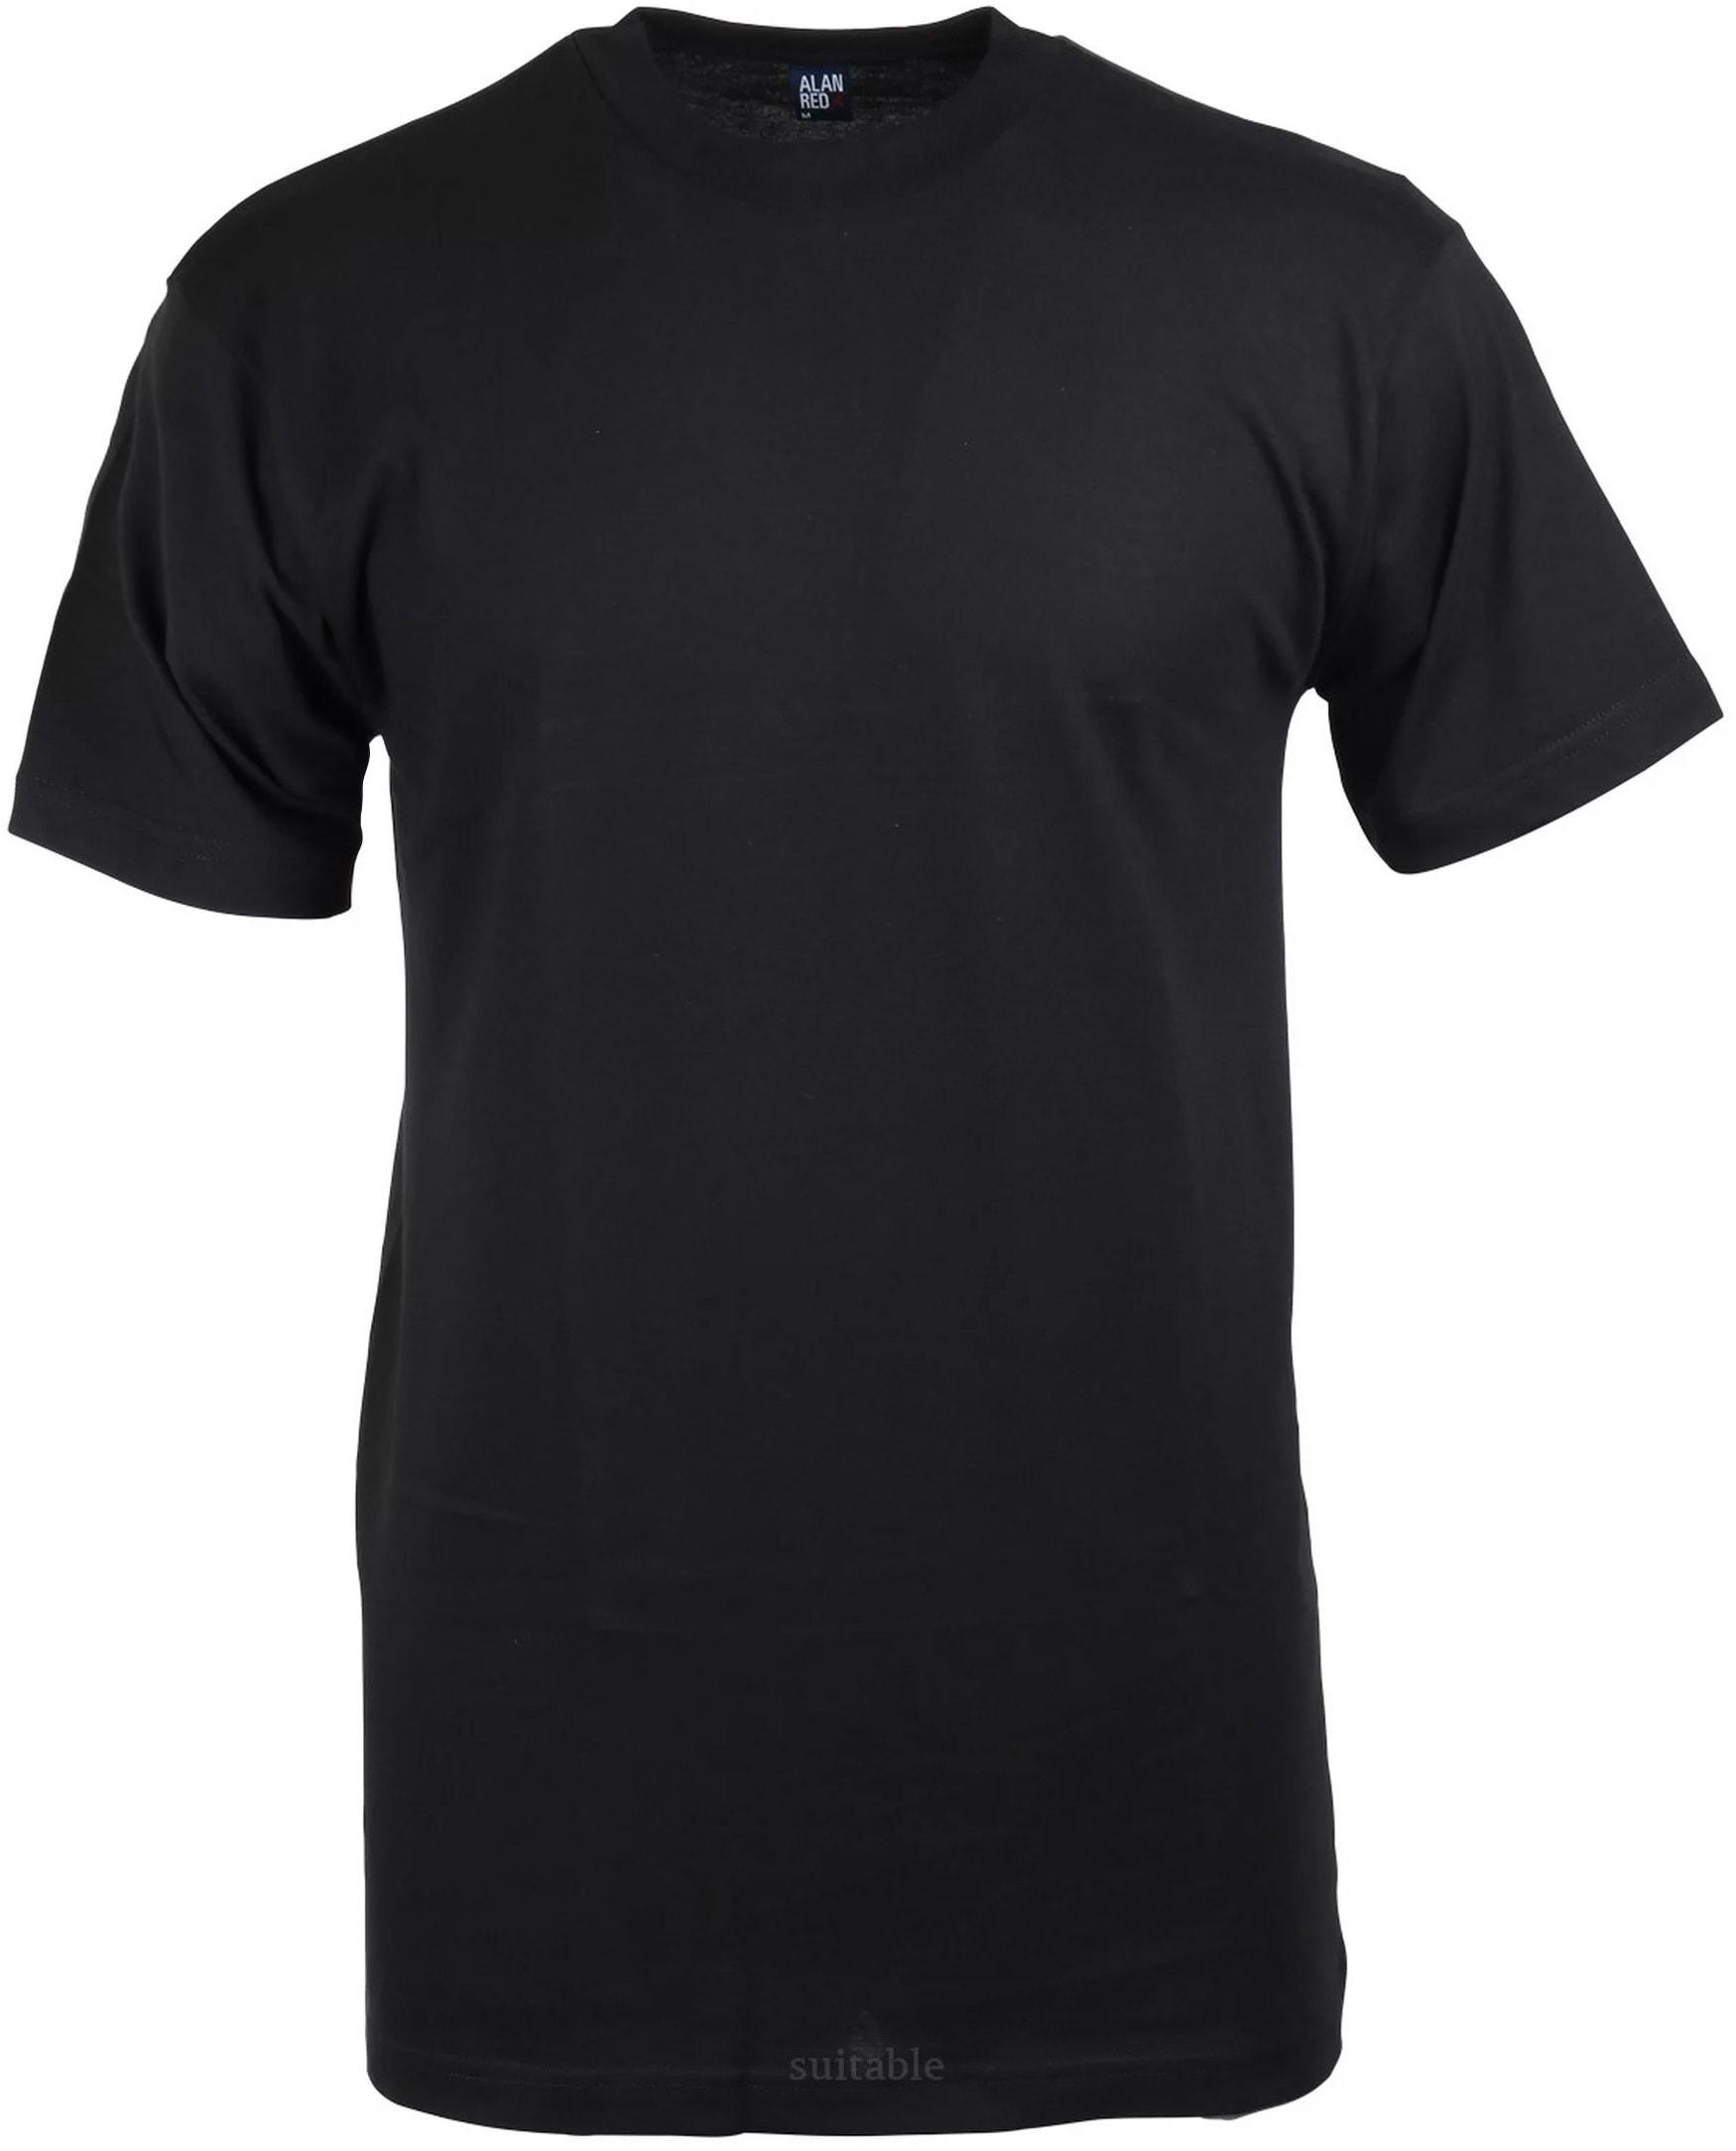 Alan Red T-shirt Virginia Zwart (1pack) foto 0